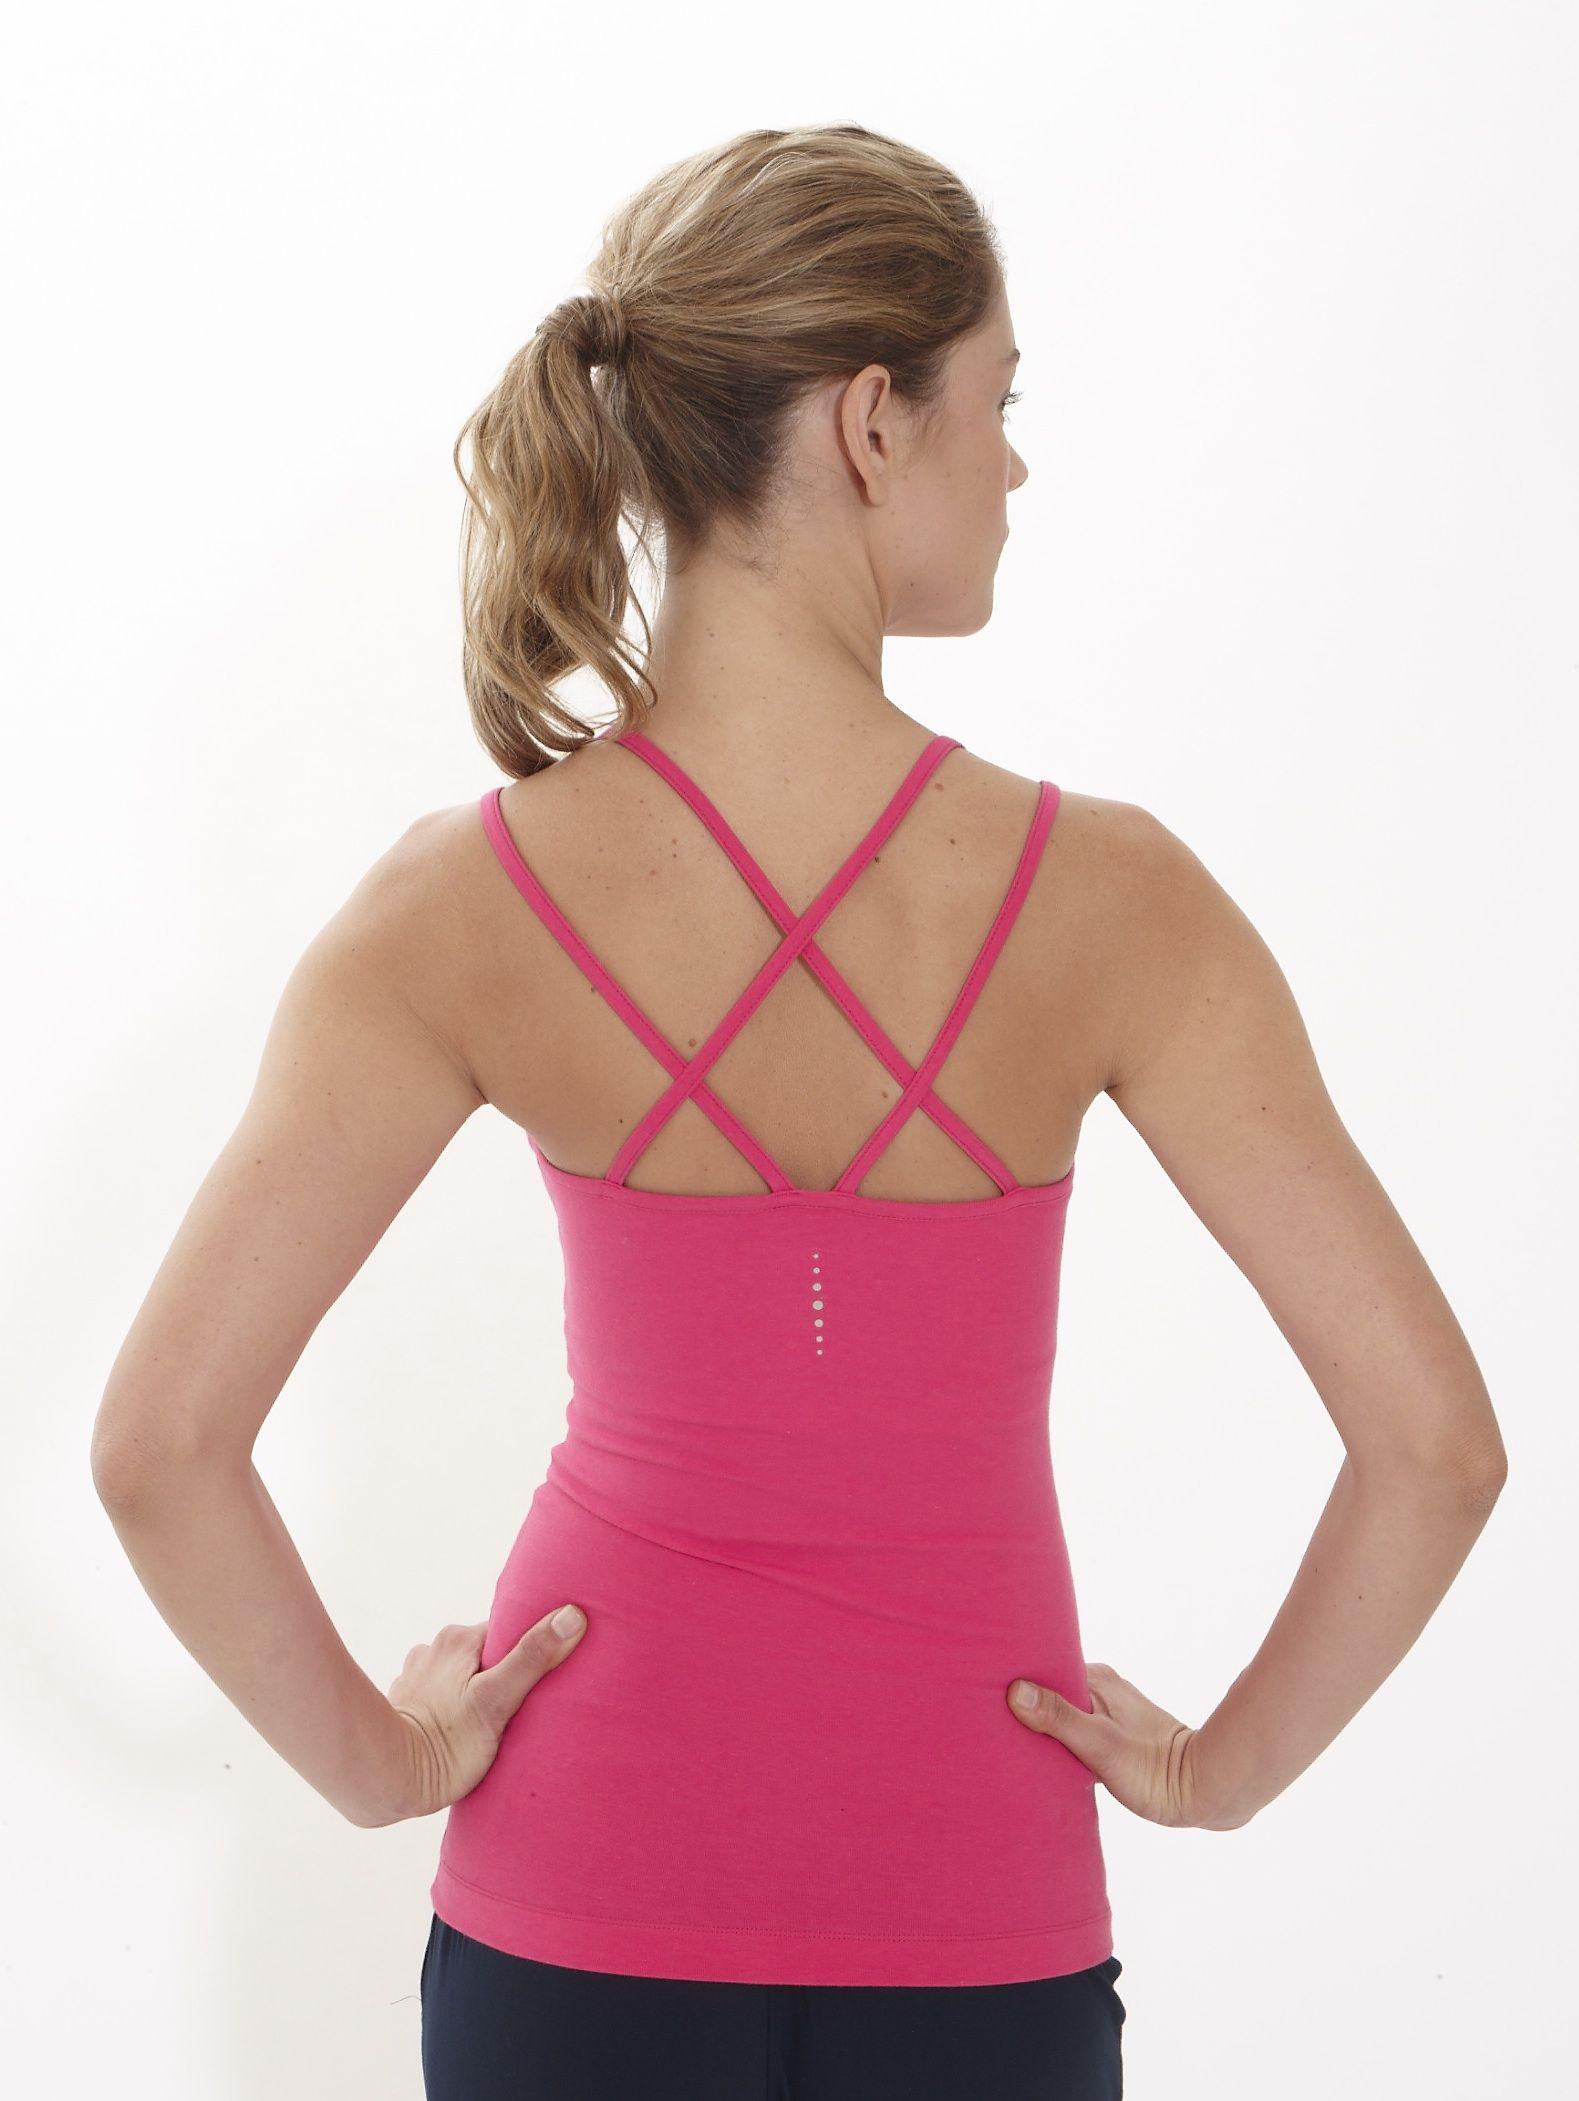 #yoga #pilates #roze #top #bewust http://www.bewustgoed-winkel.nl/c-1982740/asquith/